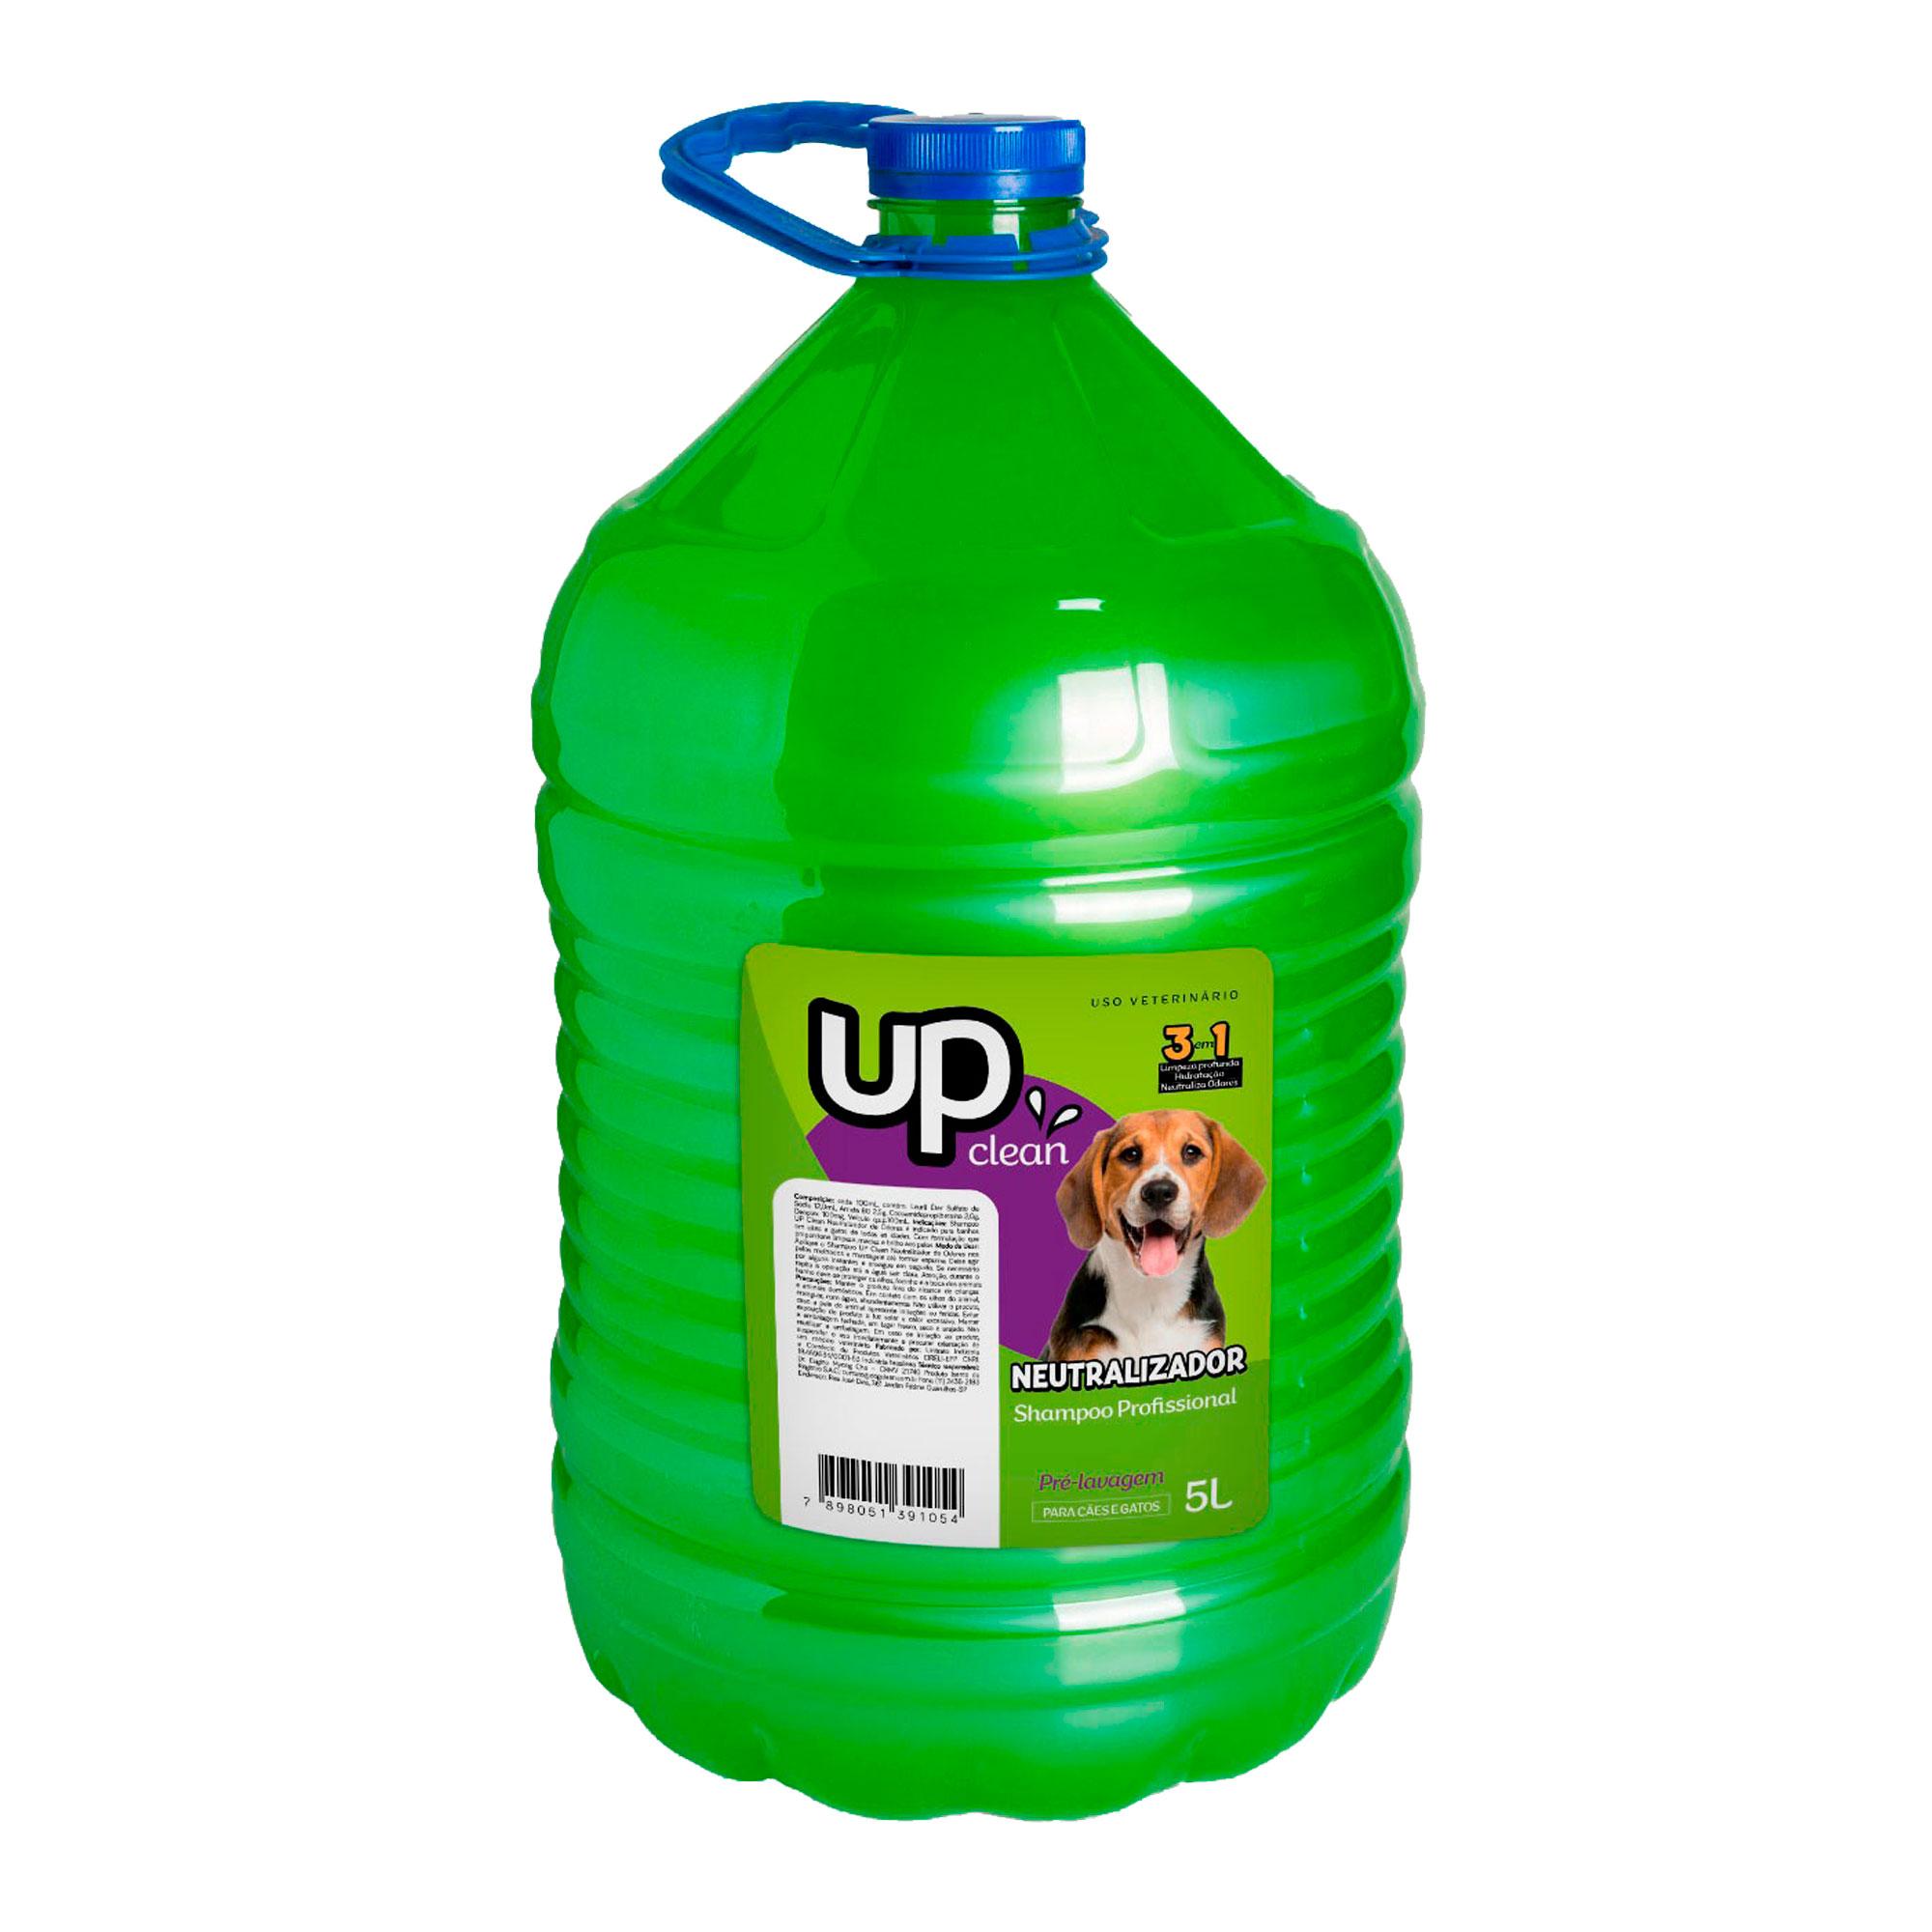 Shampoo Neutralizador de Odores 5L Up Clean